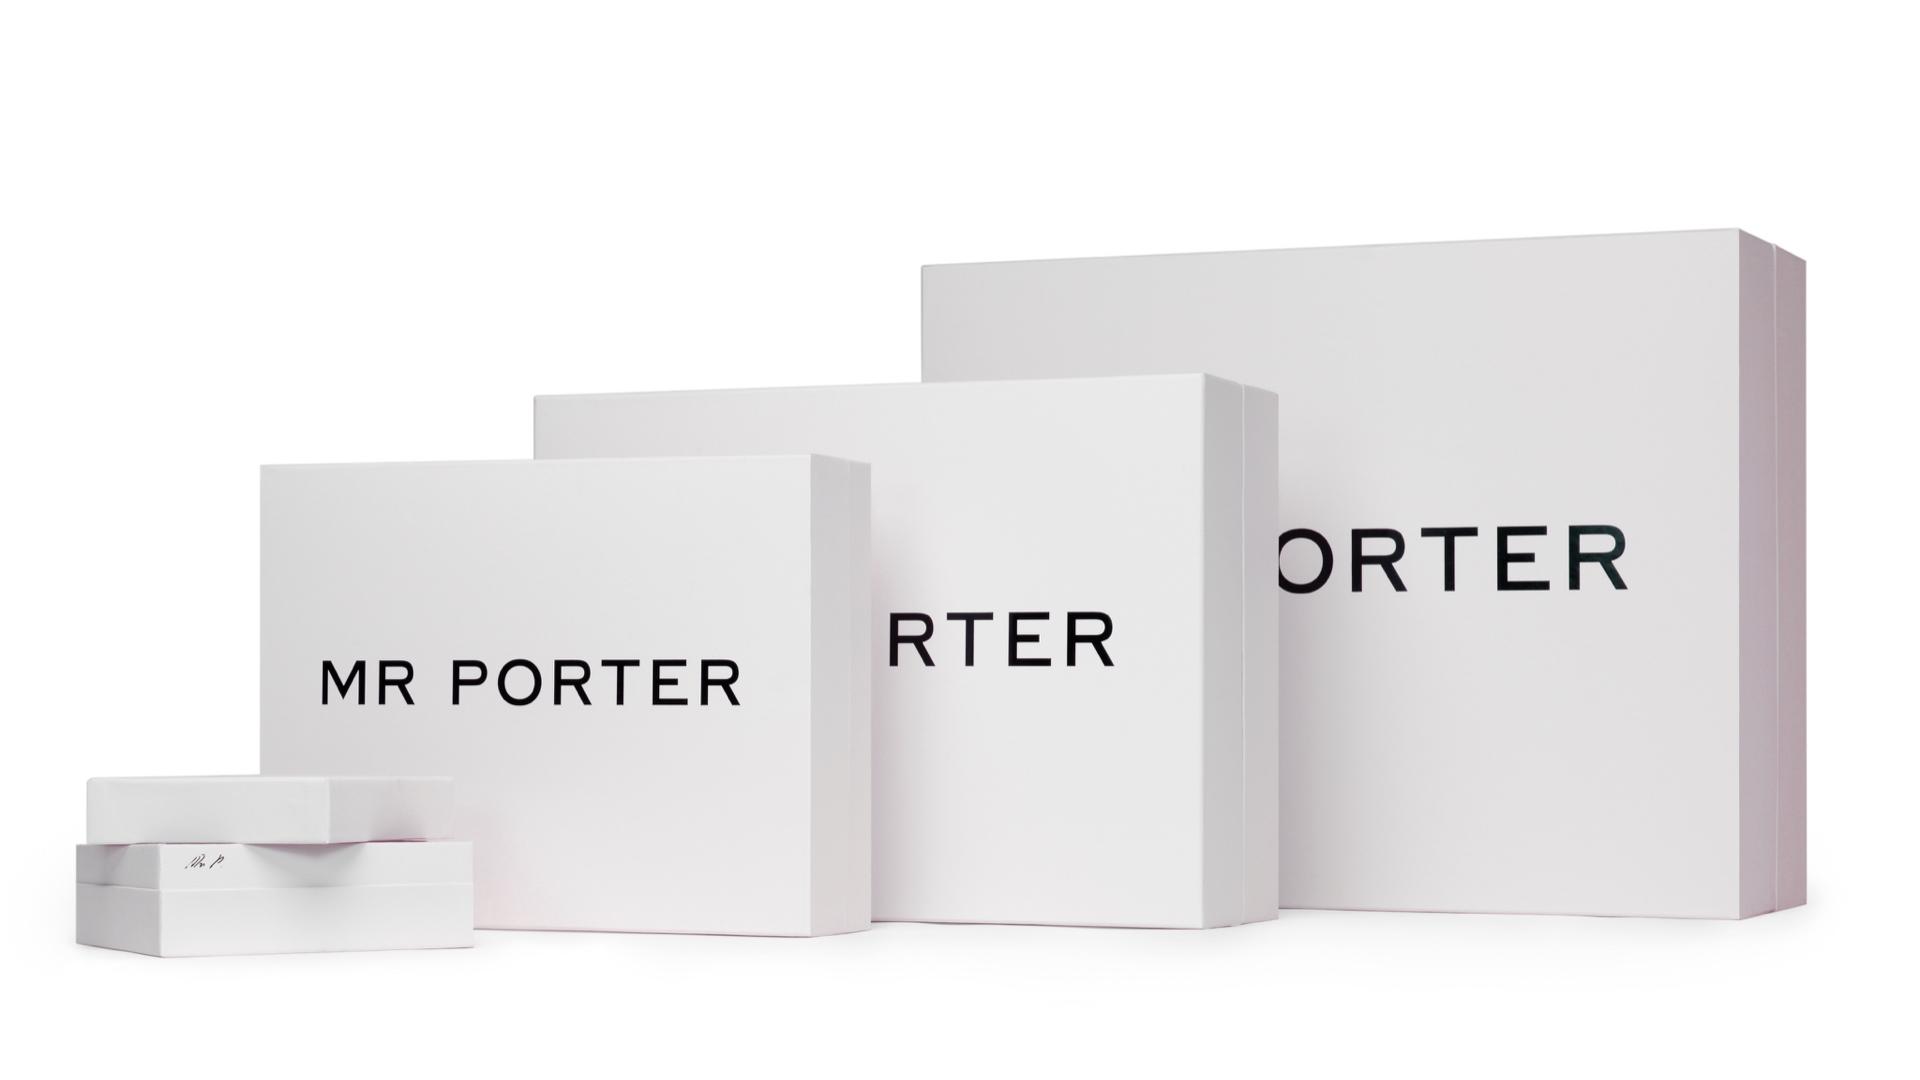 LDN_Mr Porter_Creds Deck.003.jpeg